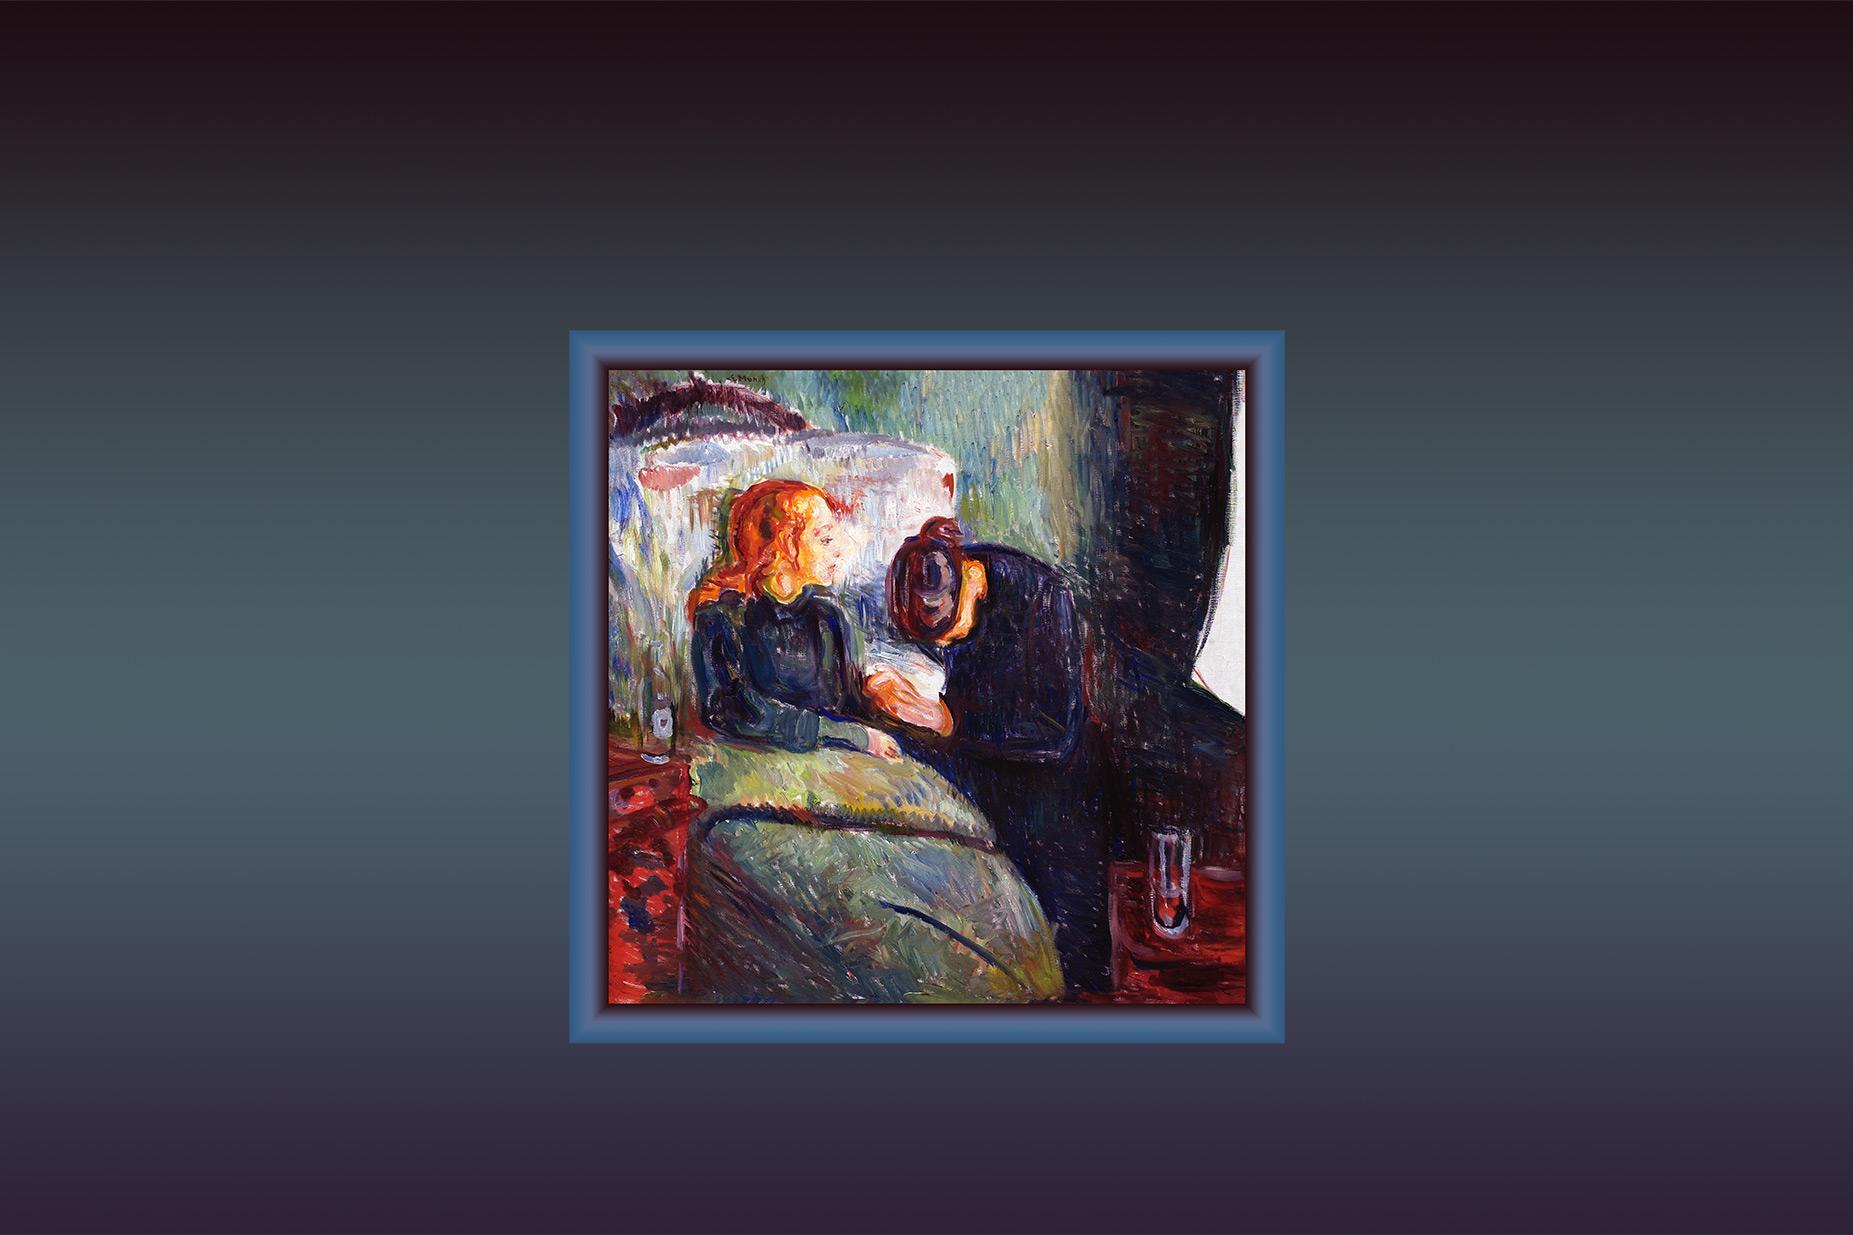 Pediatric Ethicscope cover 32(2) The Sick Child, Munch